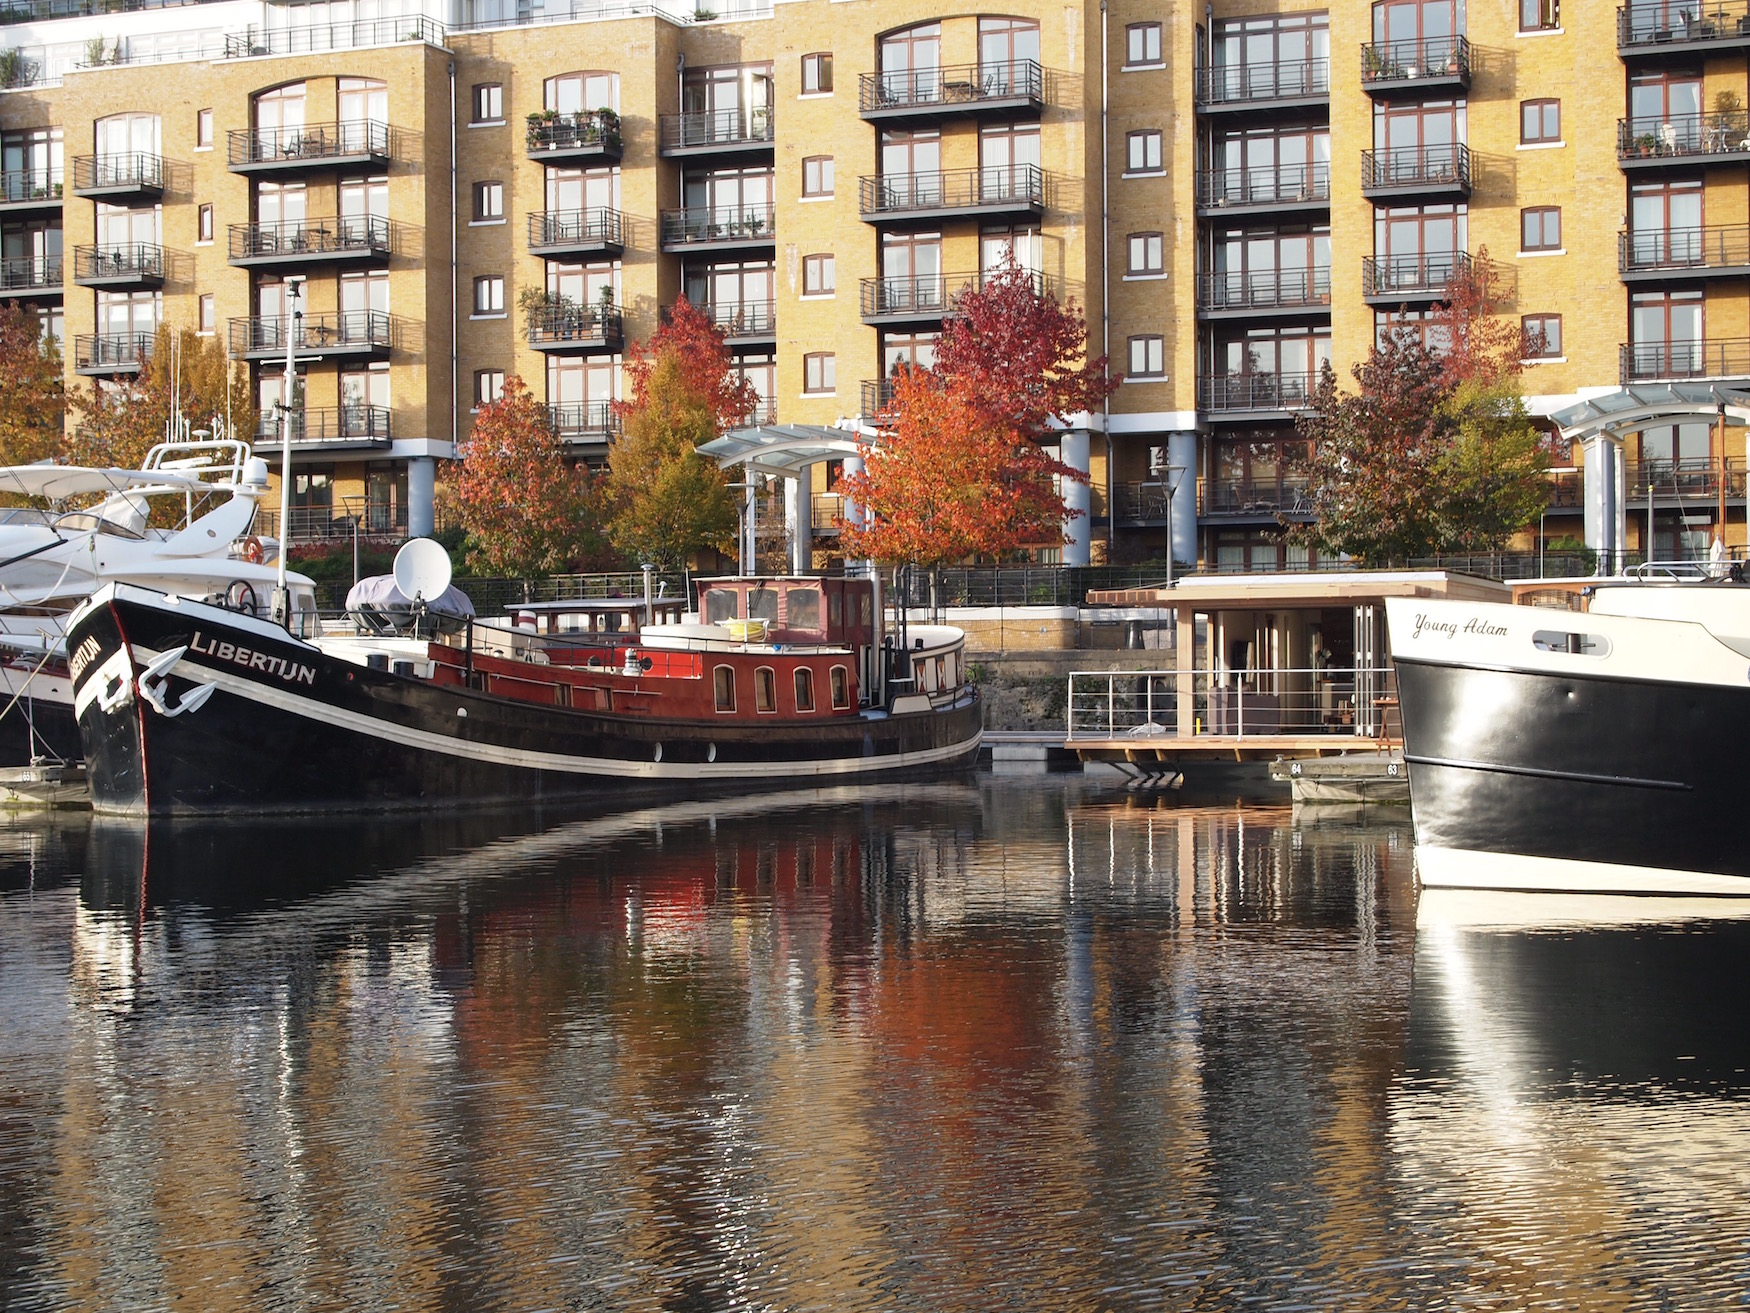 Autumn Eco floating home at St Katharine Docks